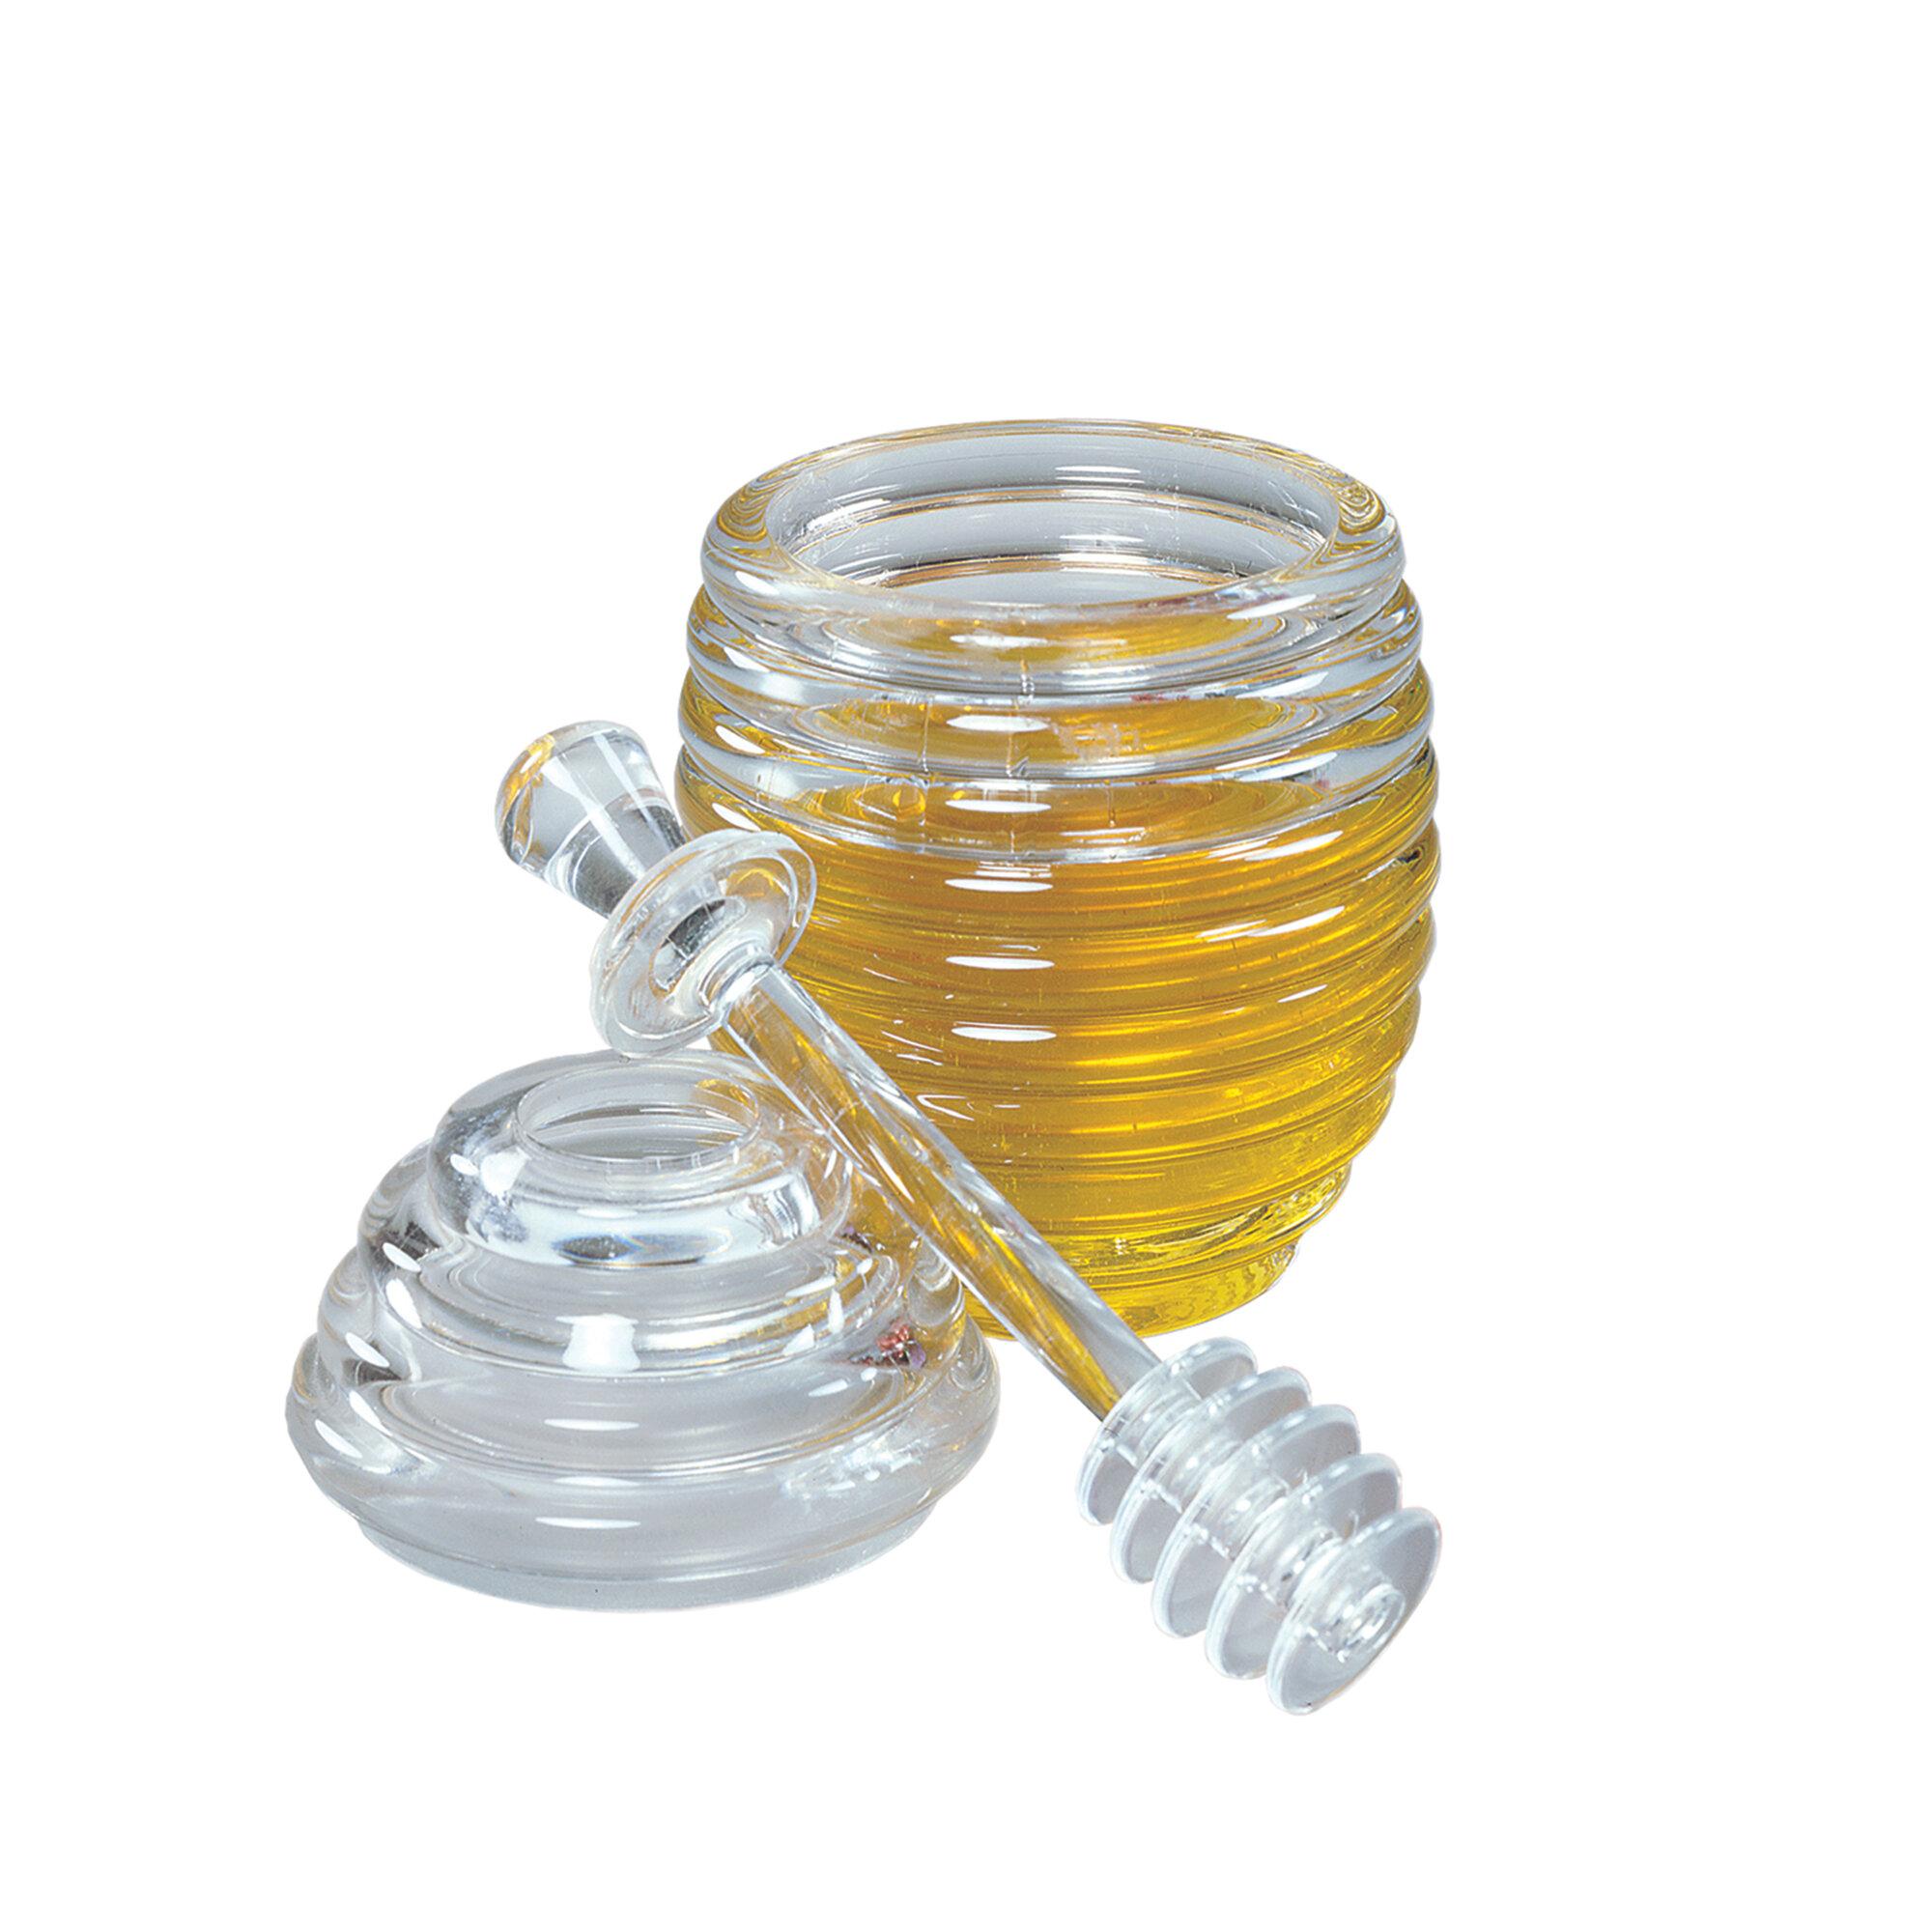 2-Piece Set Always Time For Tea White 5 x 5 Stoneware Honey Pot With Dipper